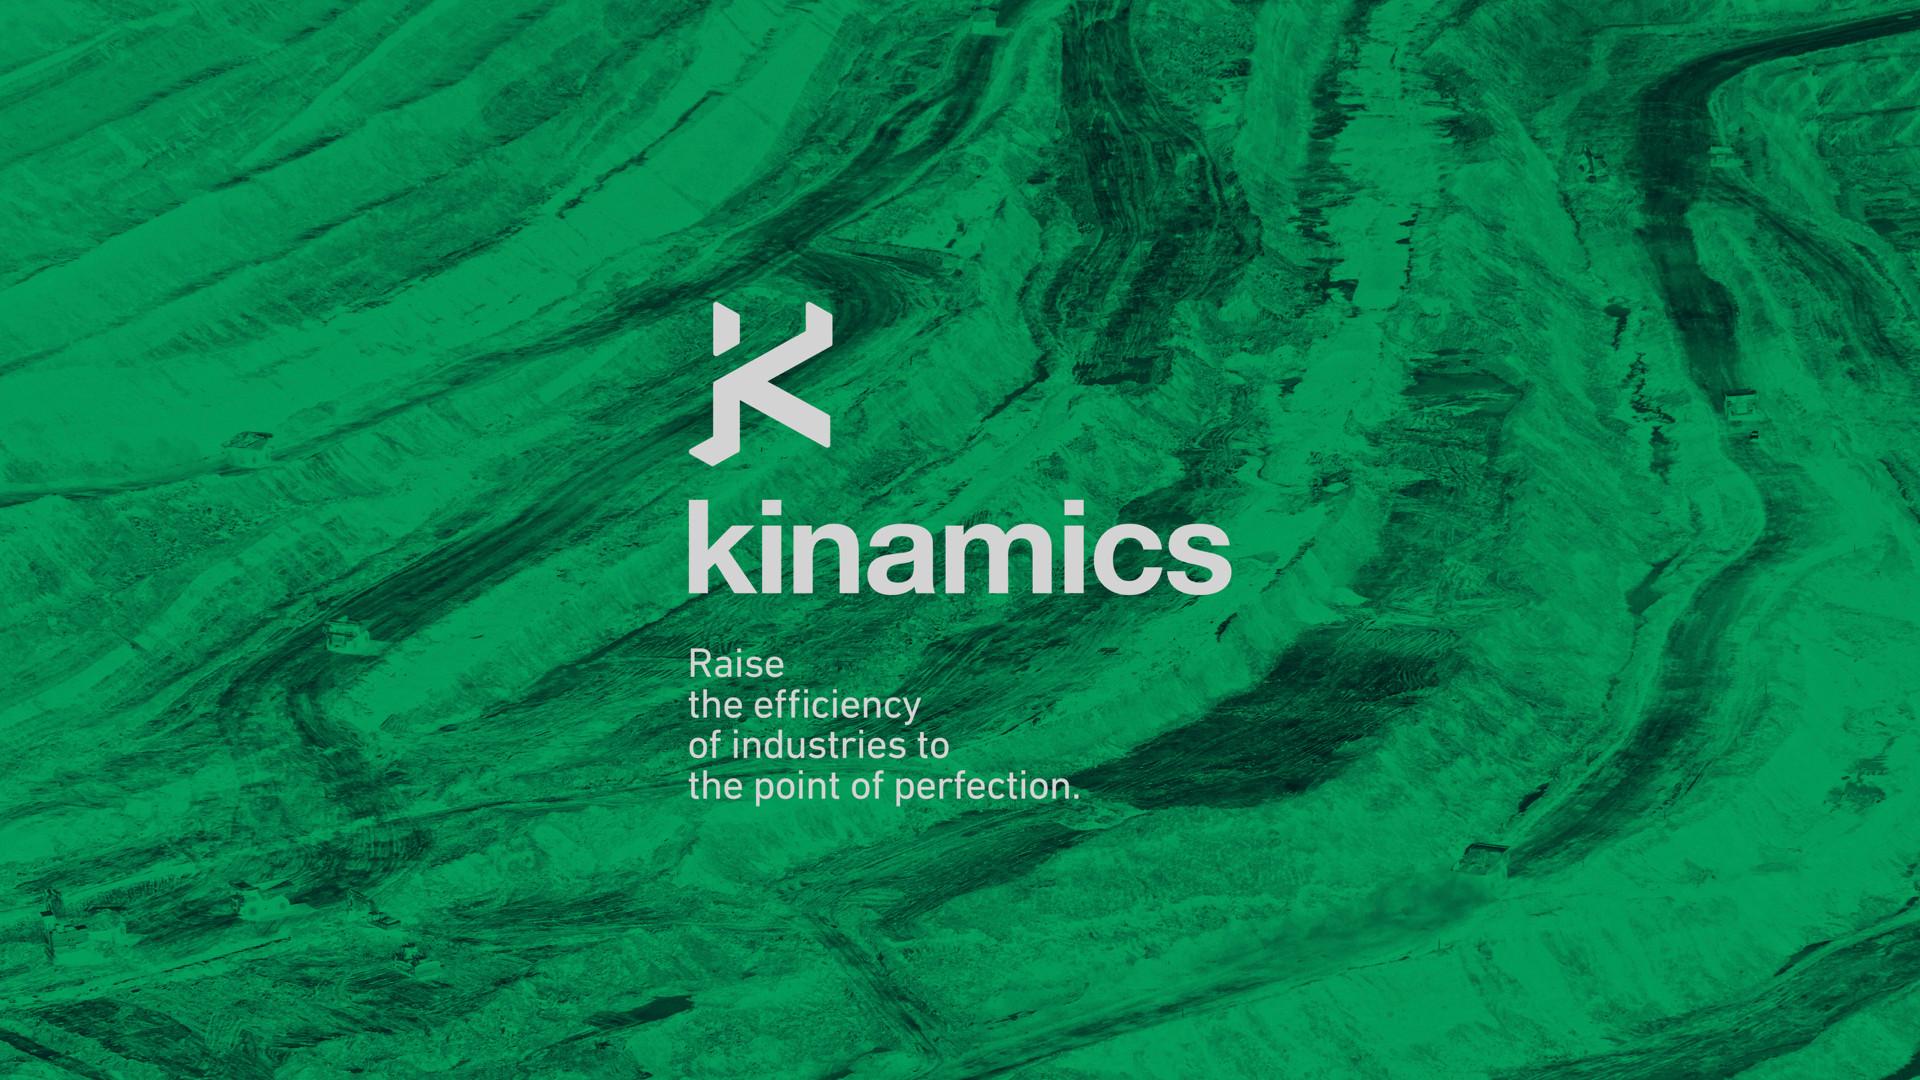 KINAMICS.001.jpeg